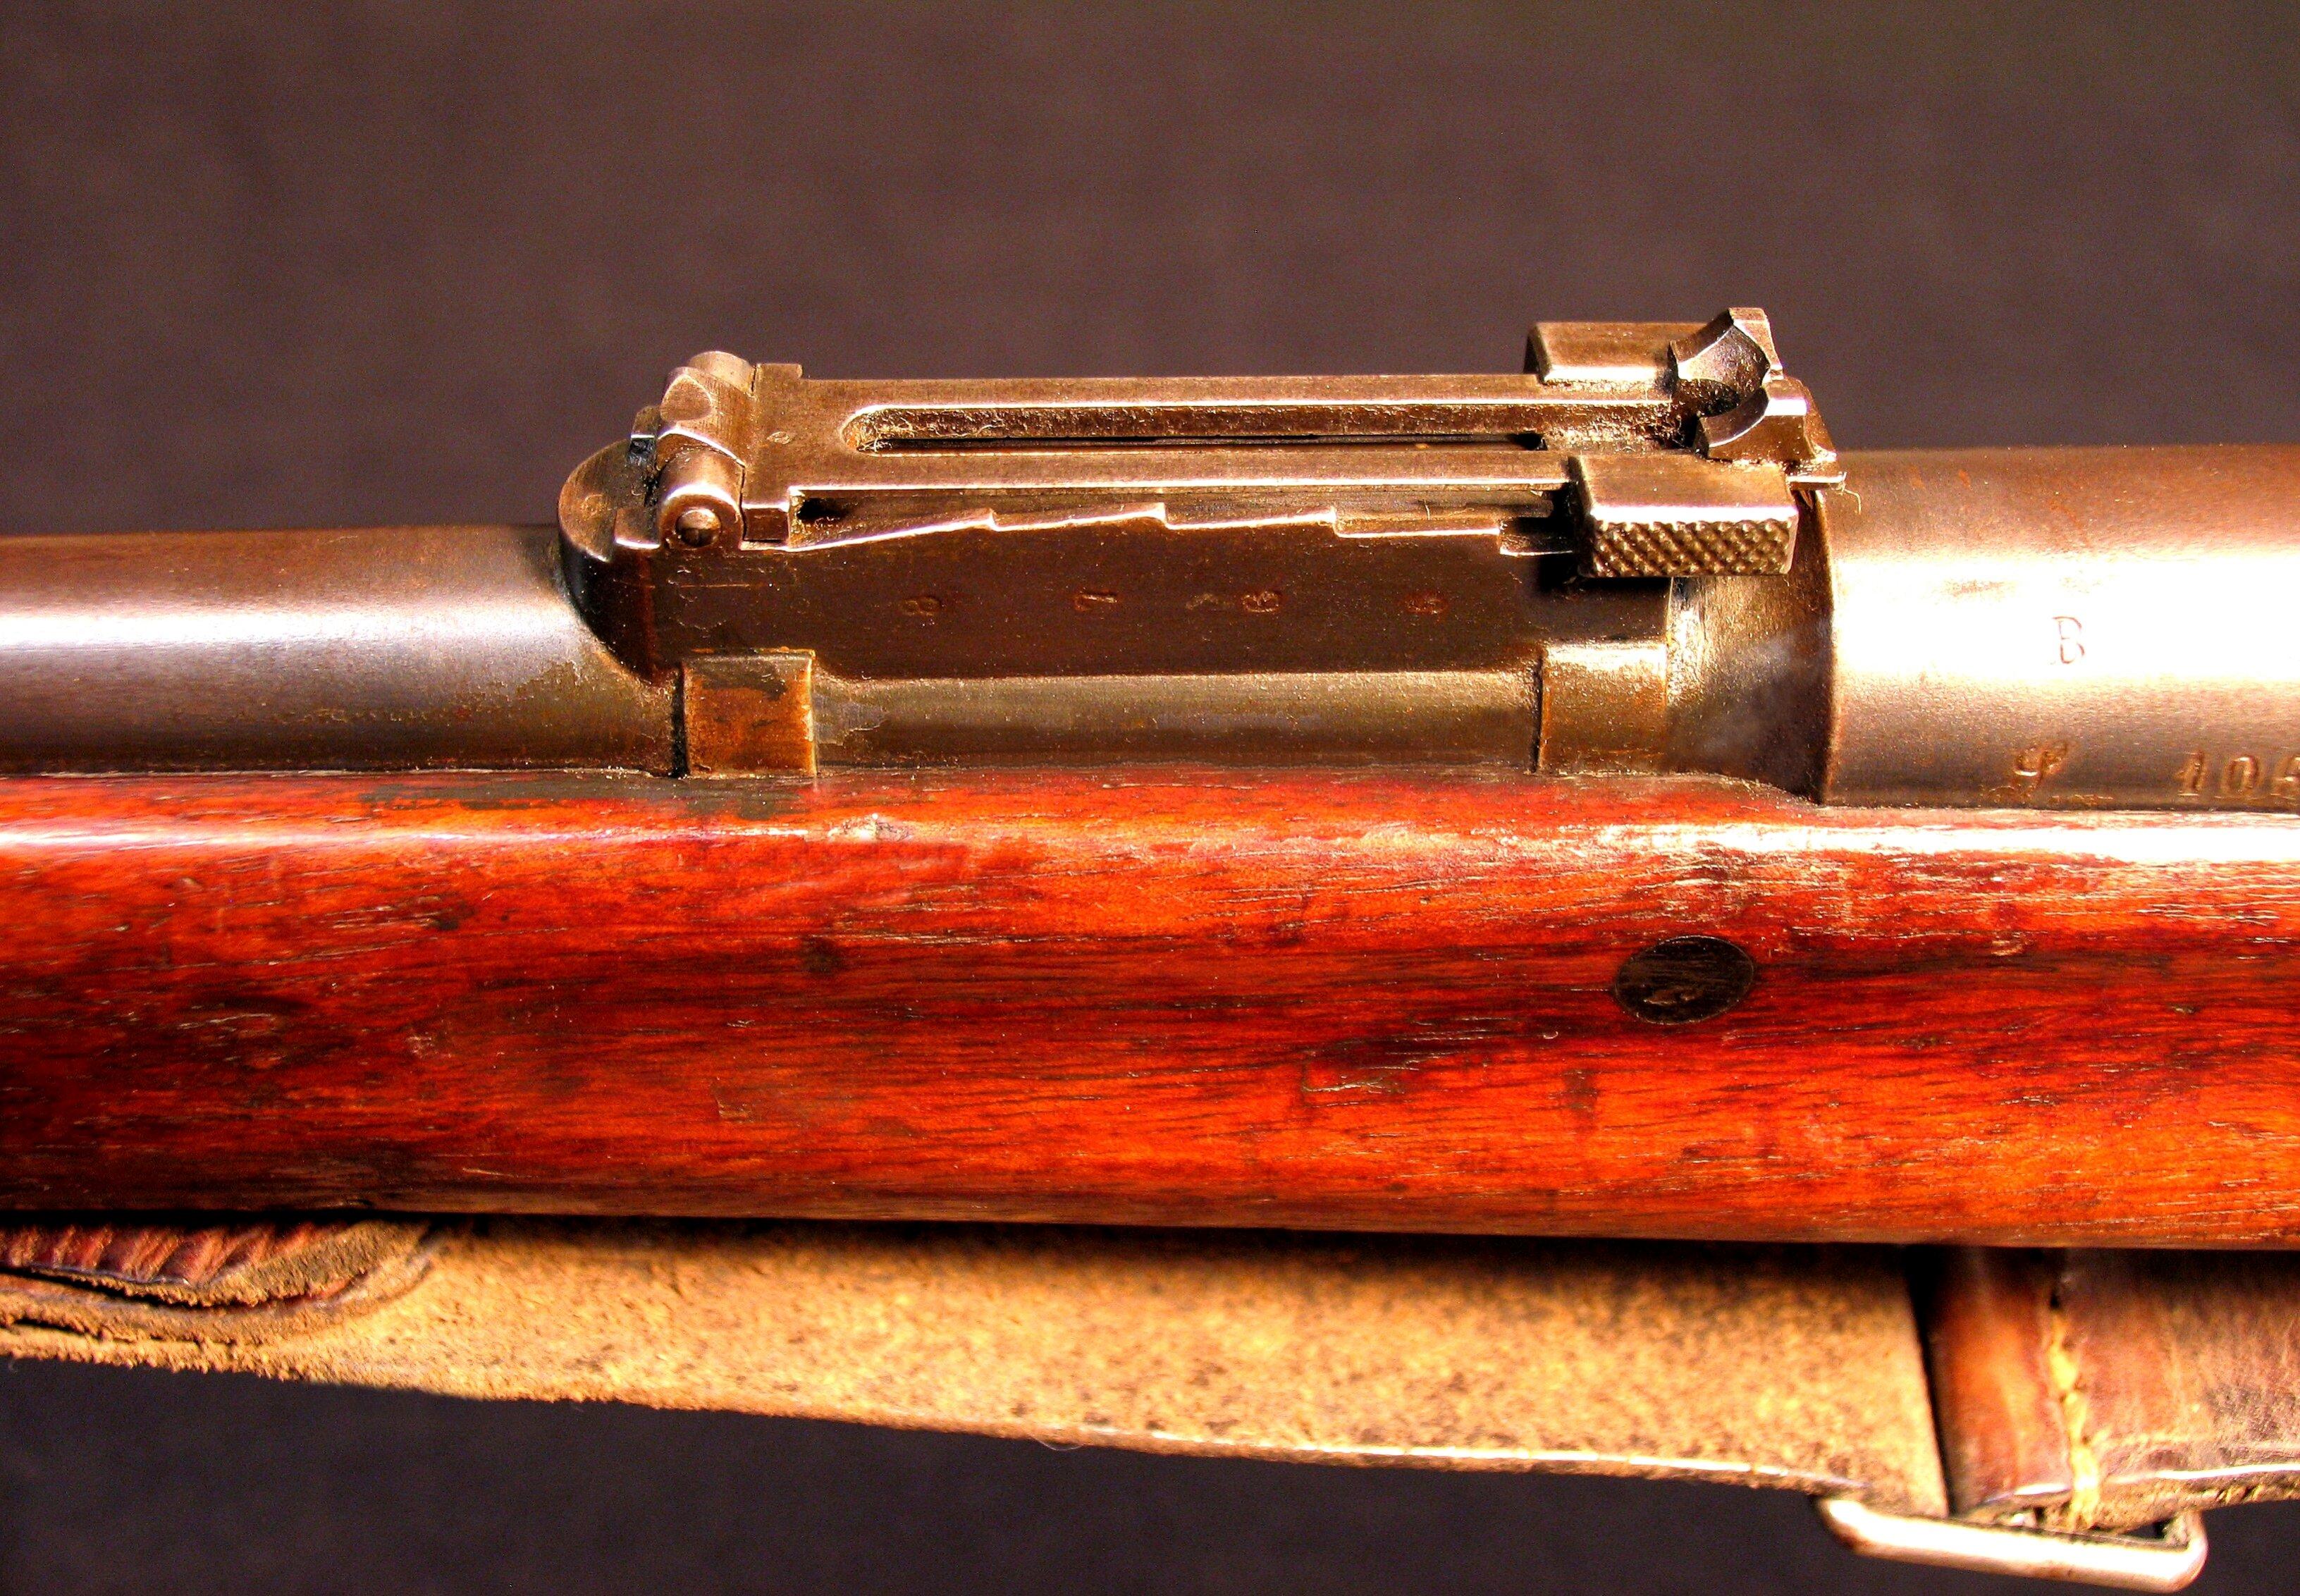 Click image for larger version.  Name:Mle 1886 Lebel Rifle 01B (7).jpg Views:3 Size:1.39 MB ID:3667287